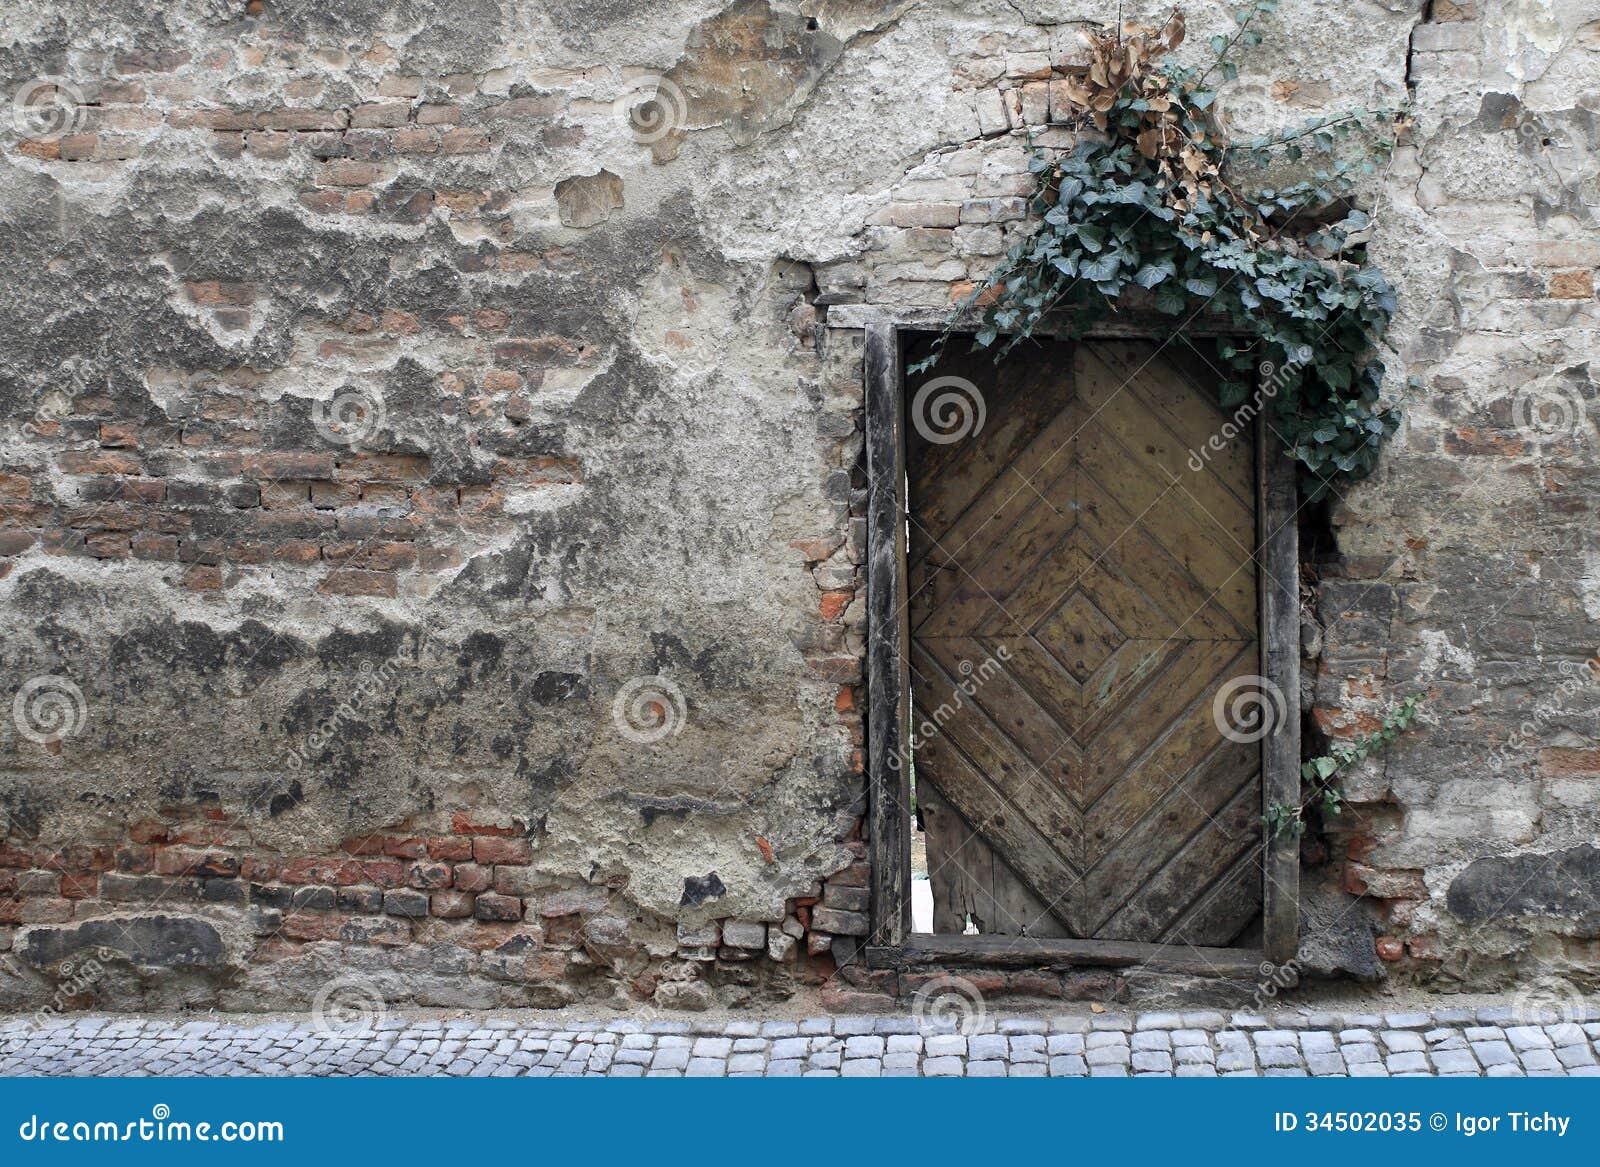 Old Crumbling Wall Royalty Free Stock Photo Image 34502035